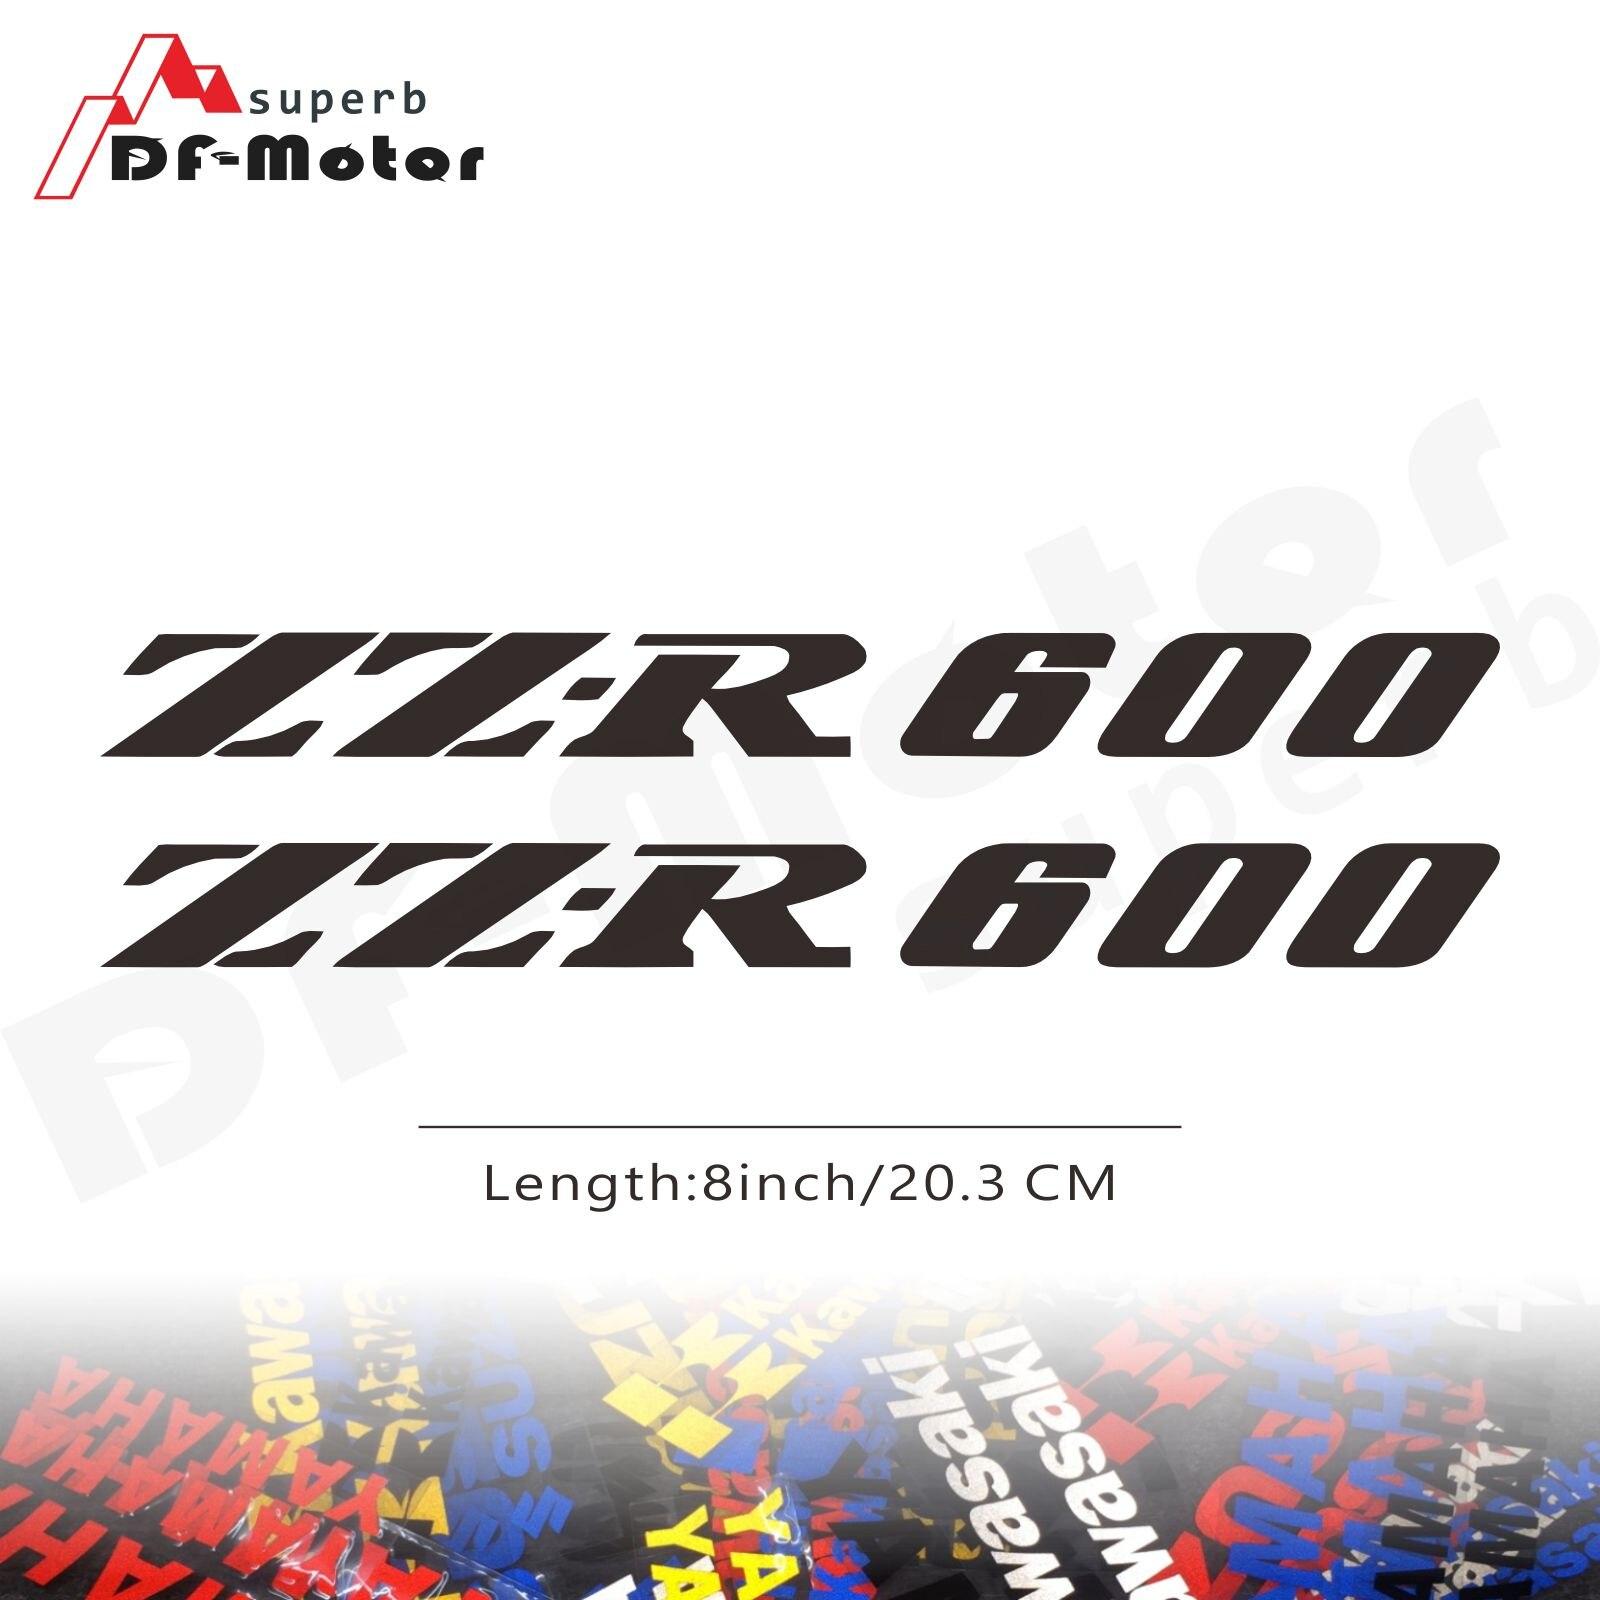 8Inch Reflective Sticker Decal Motorcycle Car Sticker Wheels Fairing Helmet Sticker Decal For Kawasaki NINJA ZZR600 ZZR 600